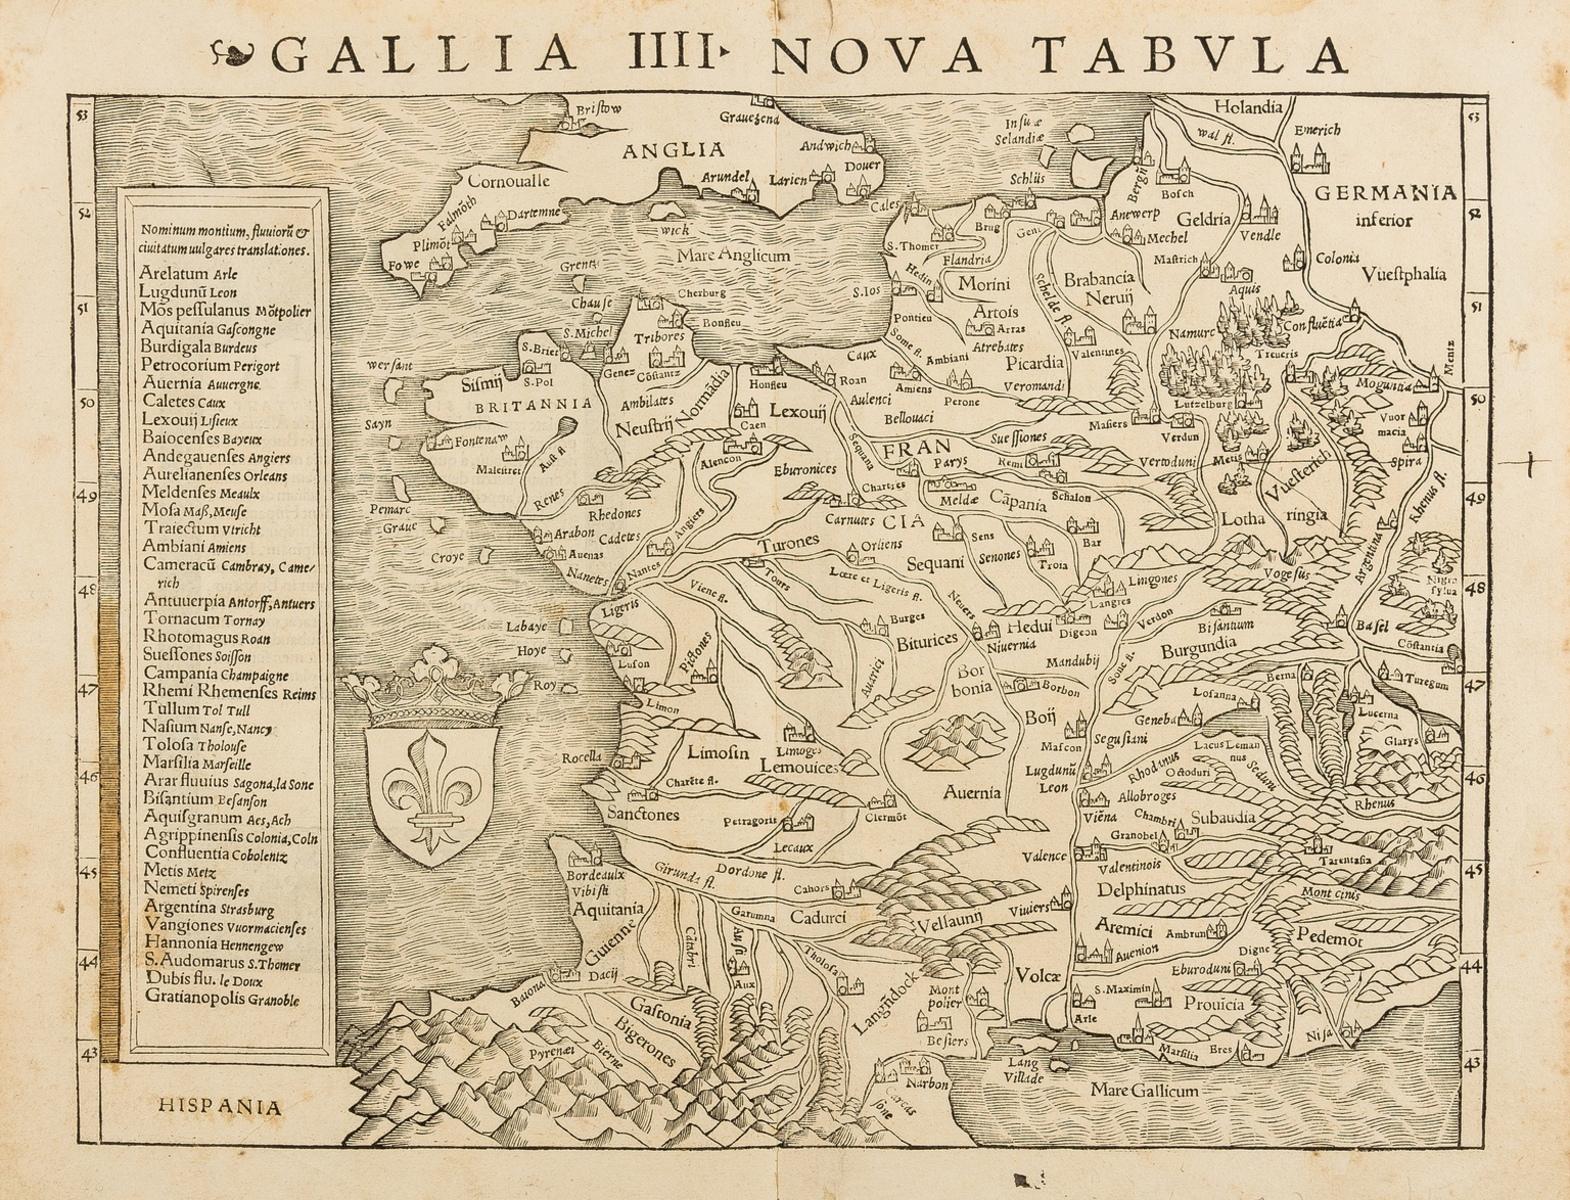 France.- Münster (Sebastian) Gallia IIII Nova Tabula, woodcut, [c. 1540]; and 19 others, mainly …